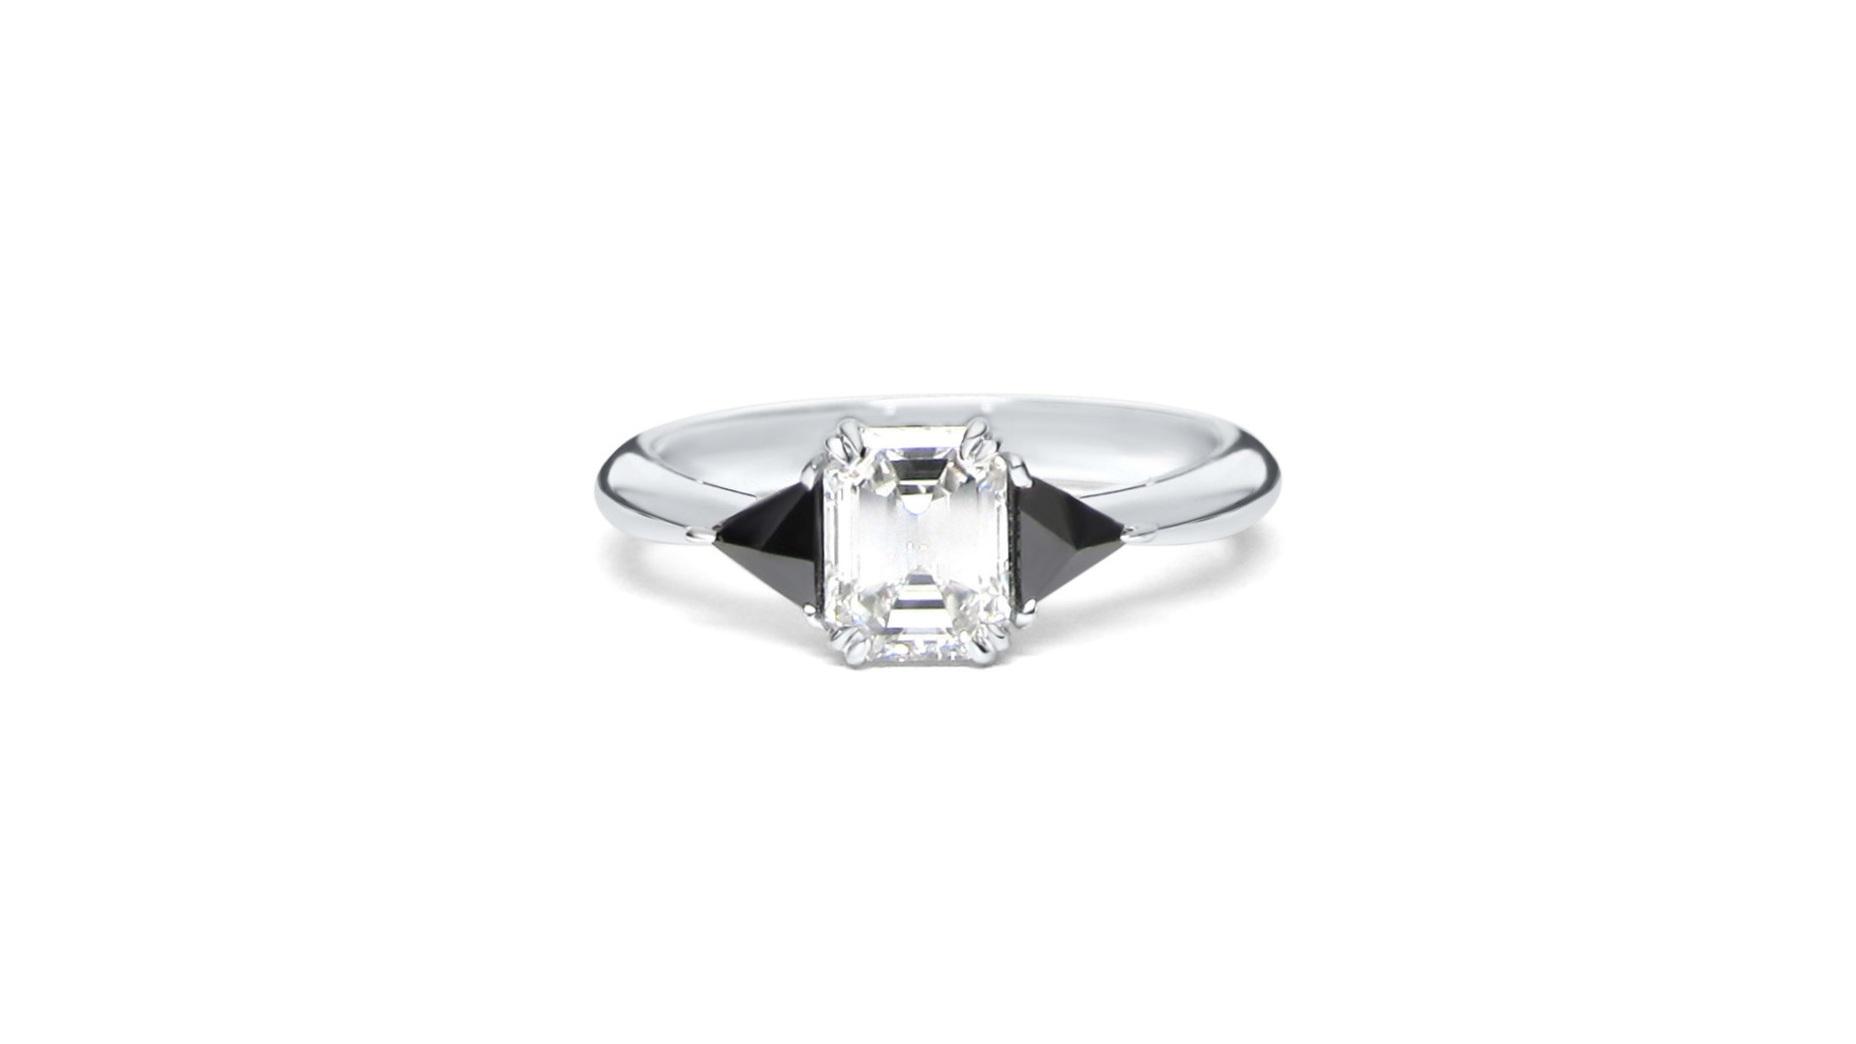 Emerald Cut Center Diamond with 2 Inverted Trillion Black Diamonds Set in 14k White Gold